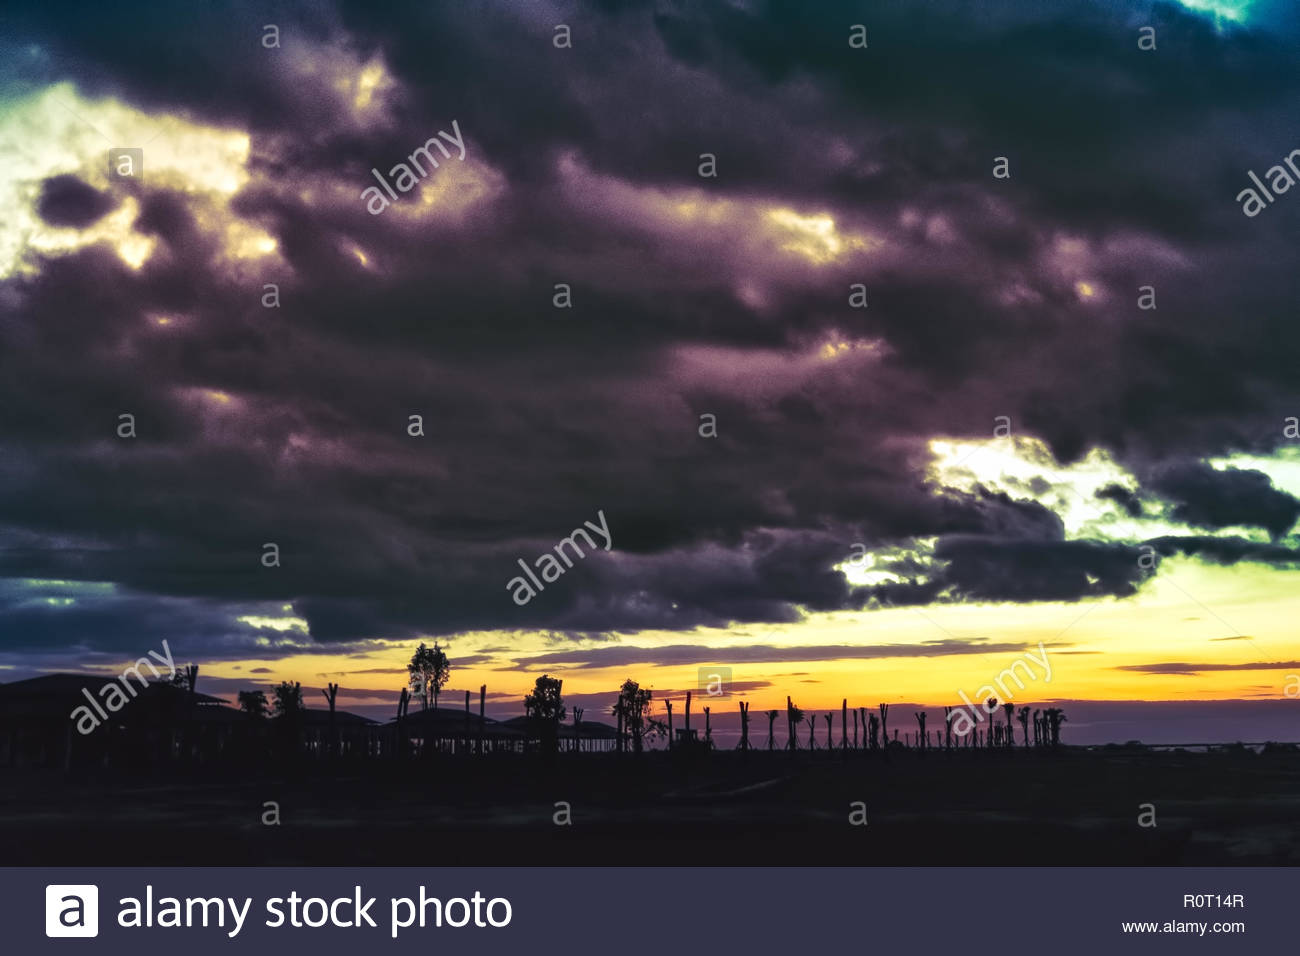 magenta sunset on the lake with backlight palms on the horizon - Stock Image